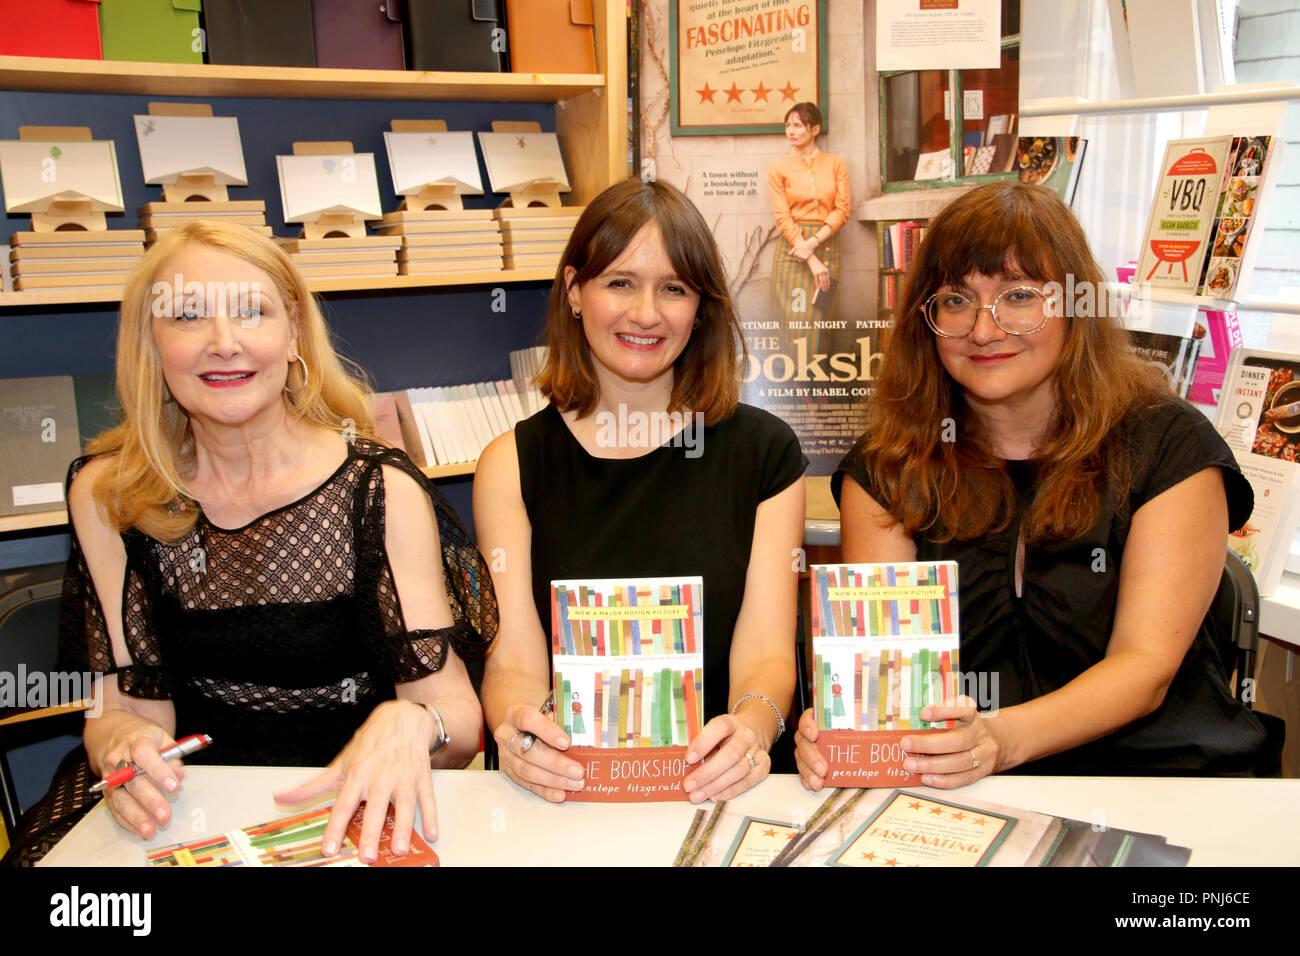 05fcbababd30 Hamptons Film Festival - 'The Bookshop' - Premiere Featuring ...